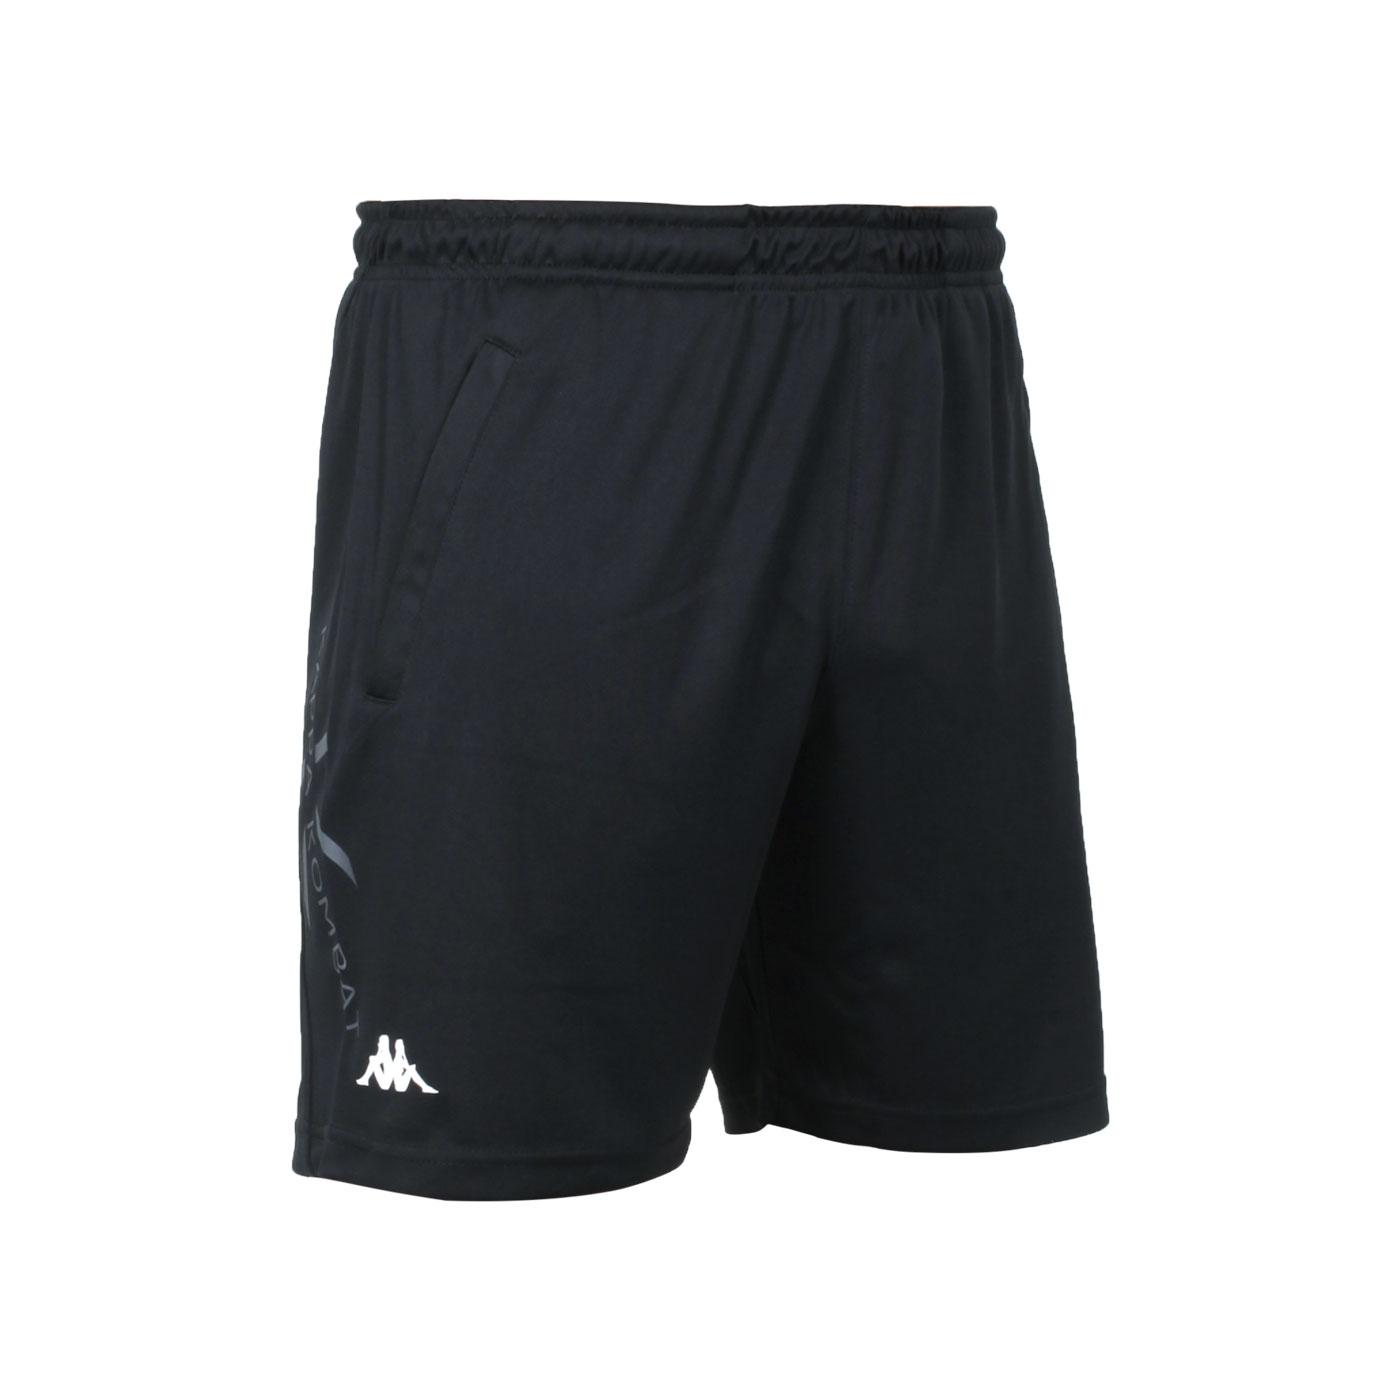 KAPPA 男款K4T針織短褲 32166XW-005 - 黑